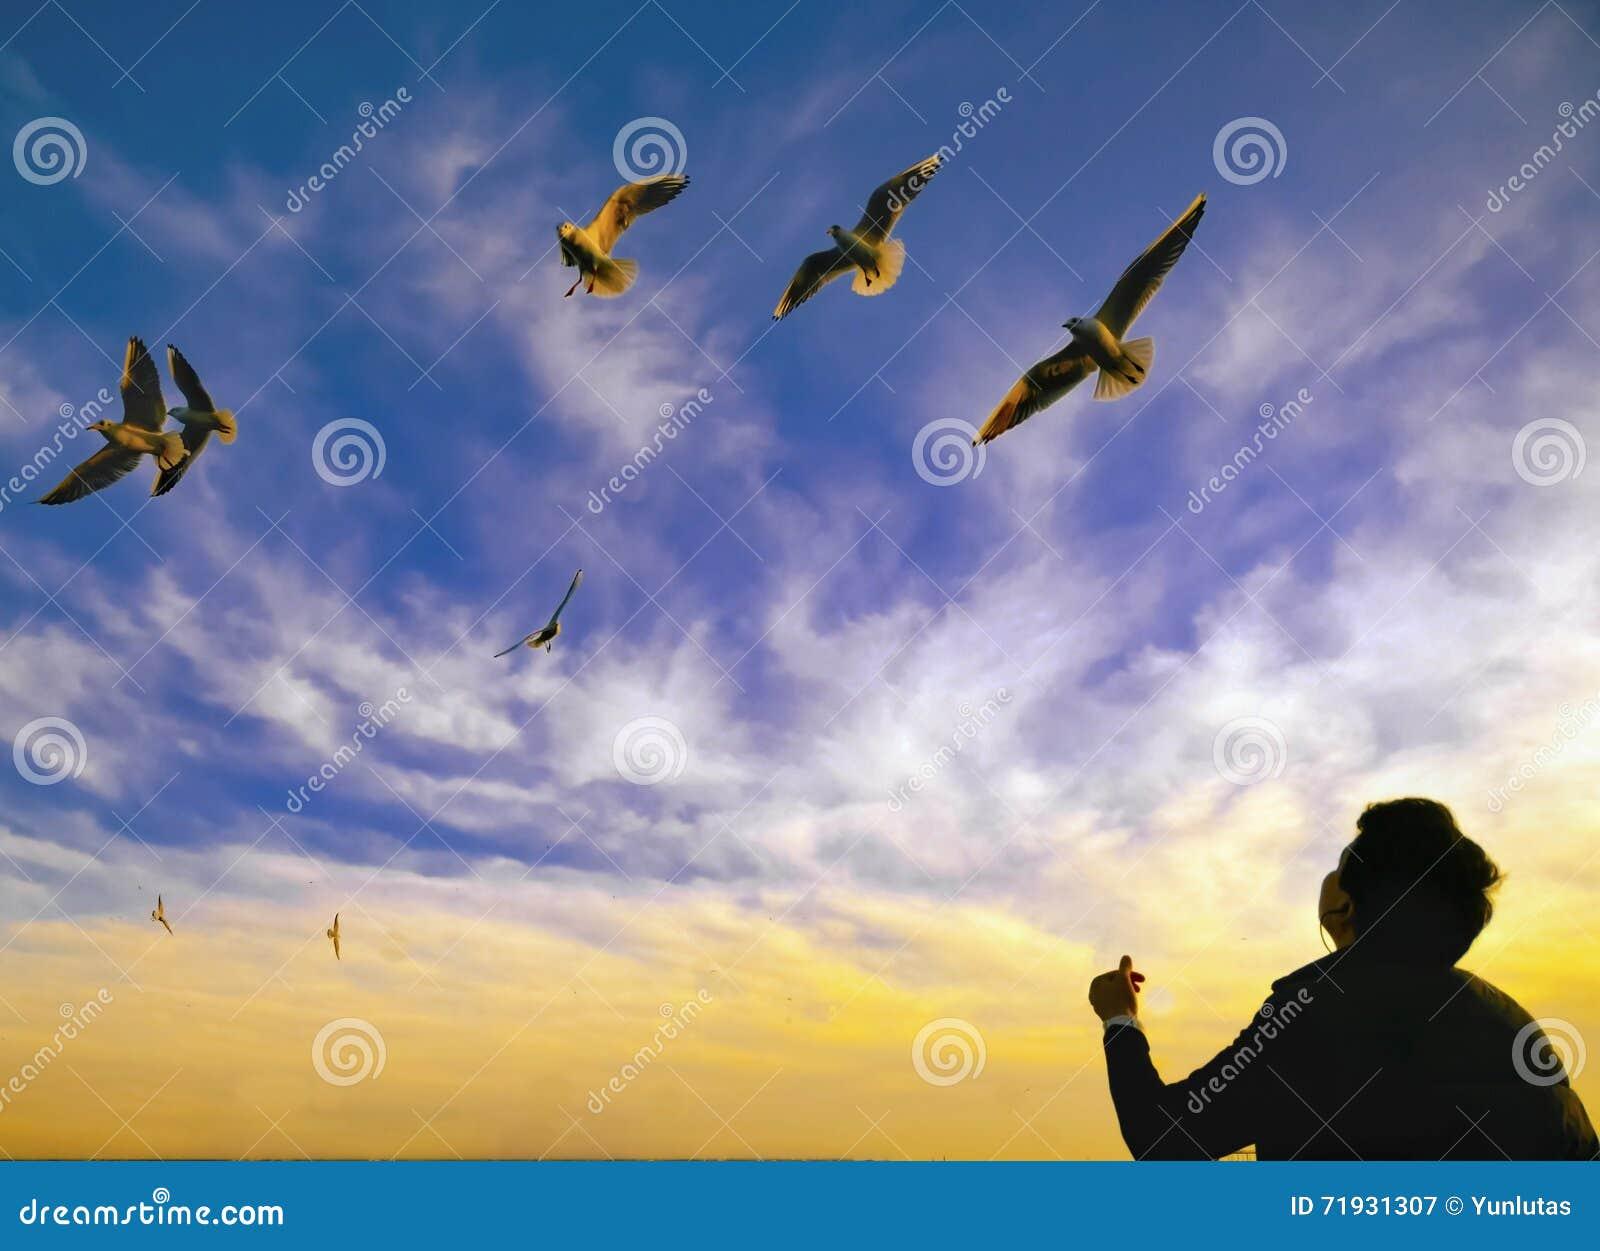 Силуэт чайок и людей захода солнца